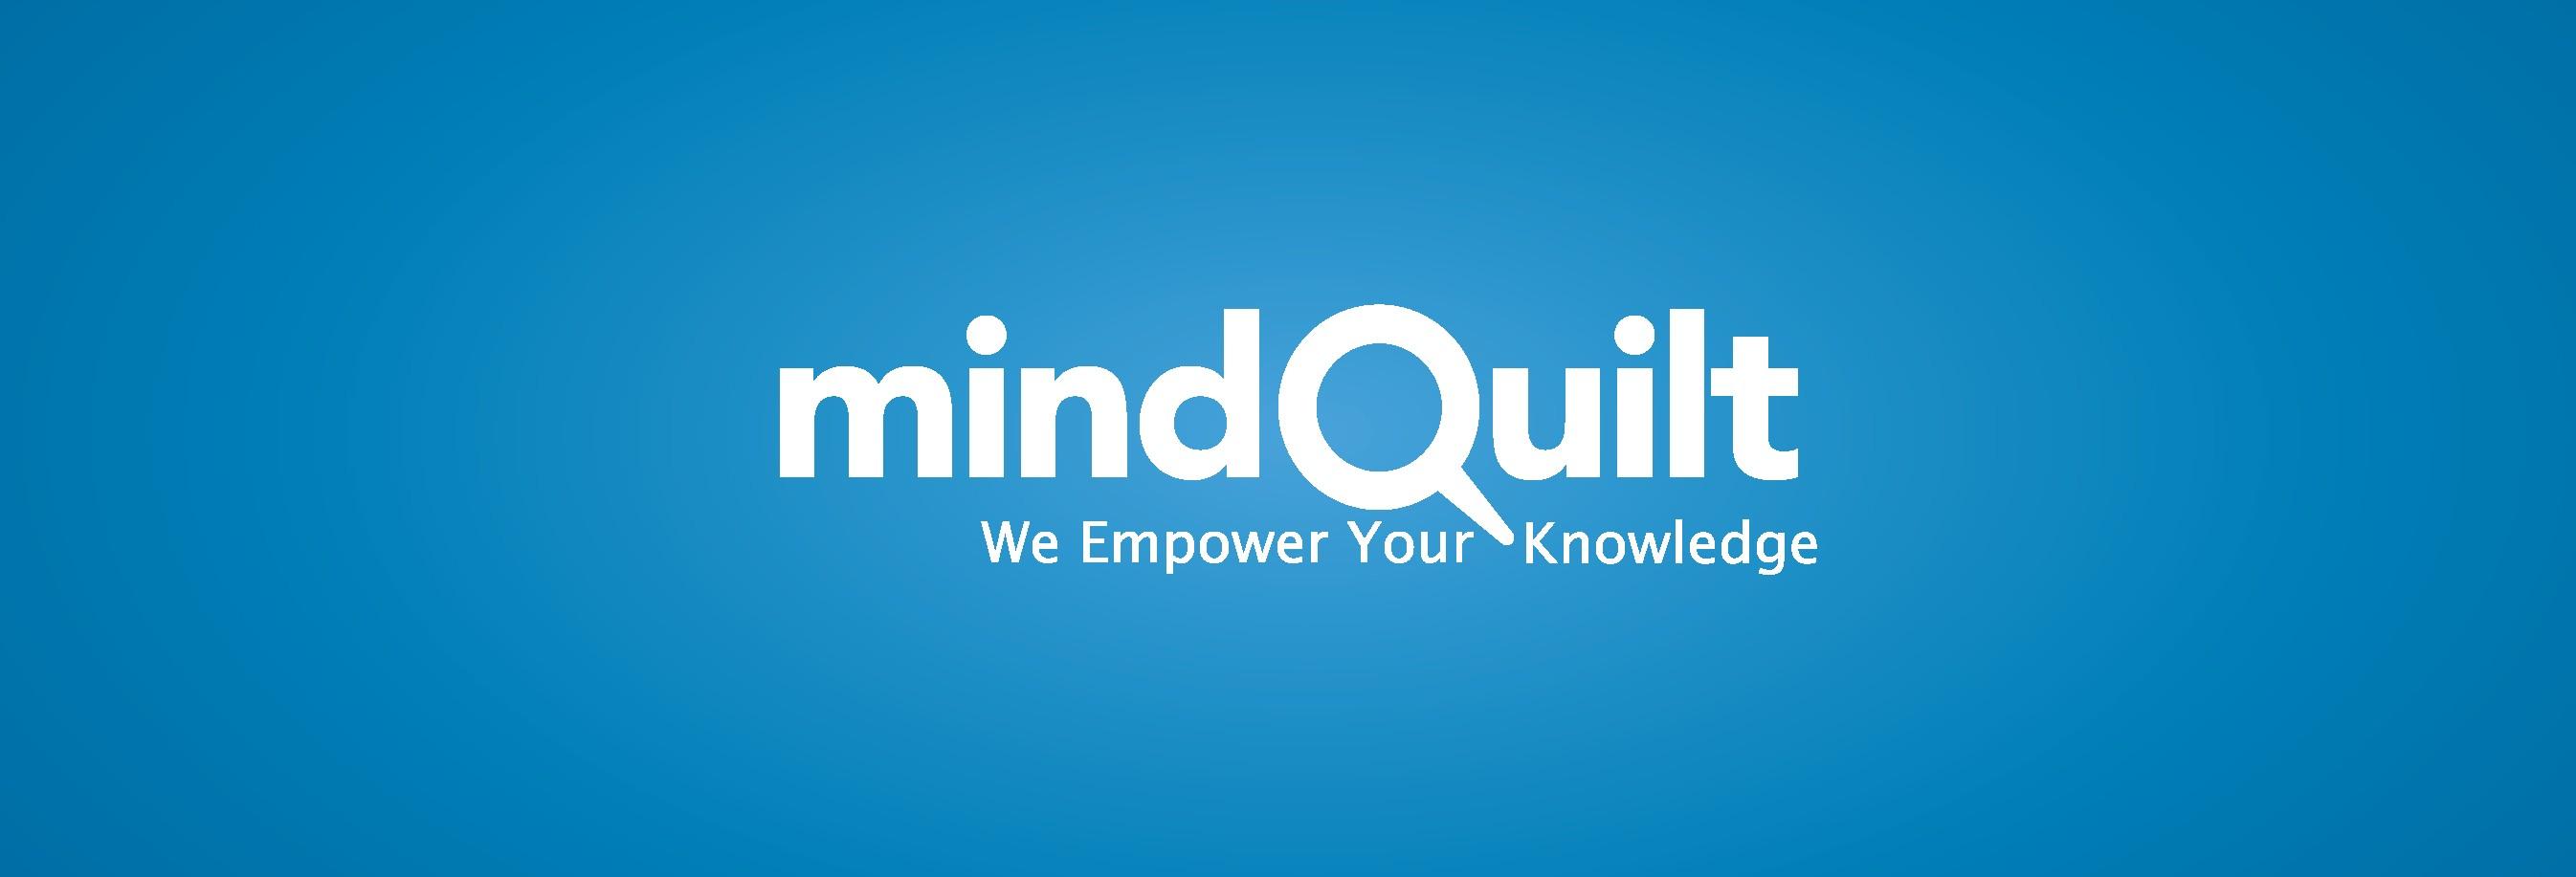 MindQuilt logo